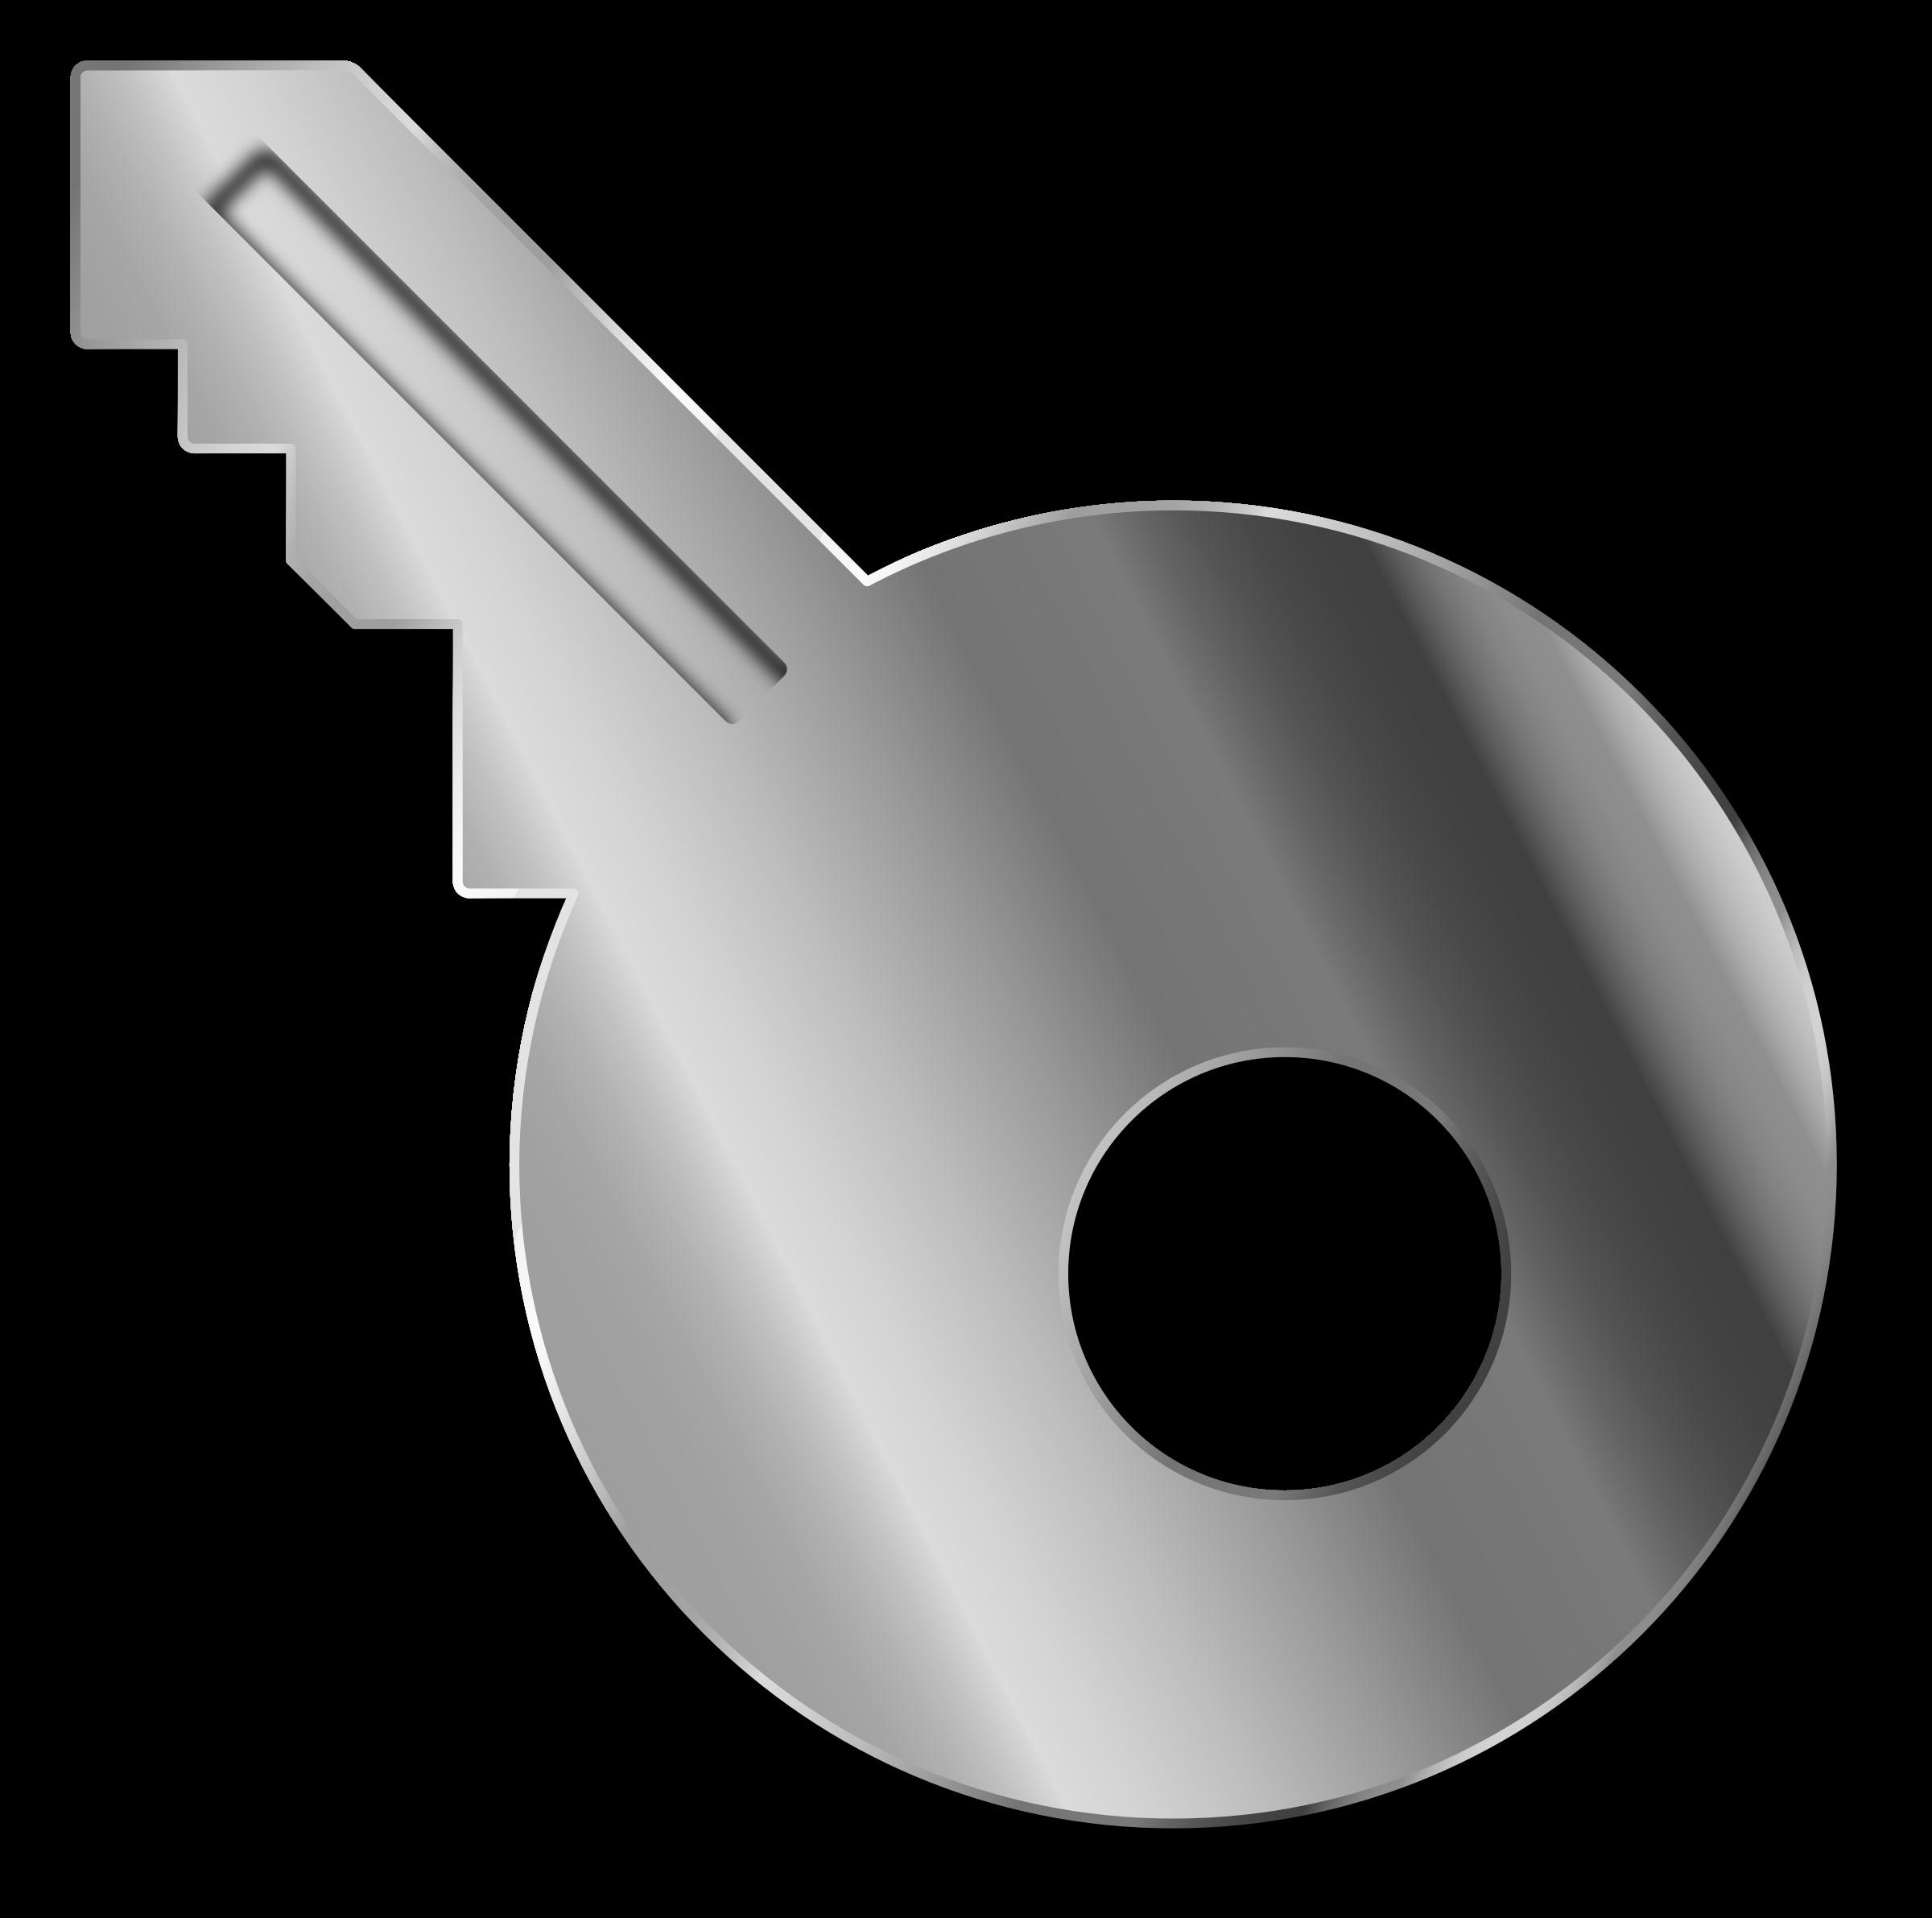 Metal clipart Metal Key Key Metal Clipart